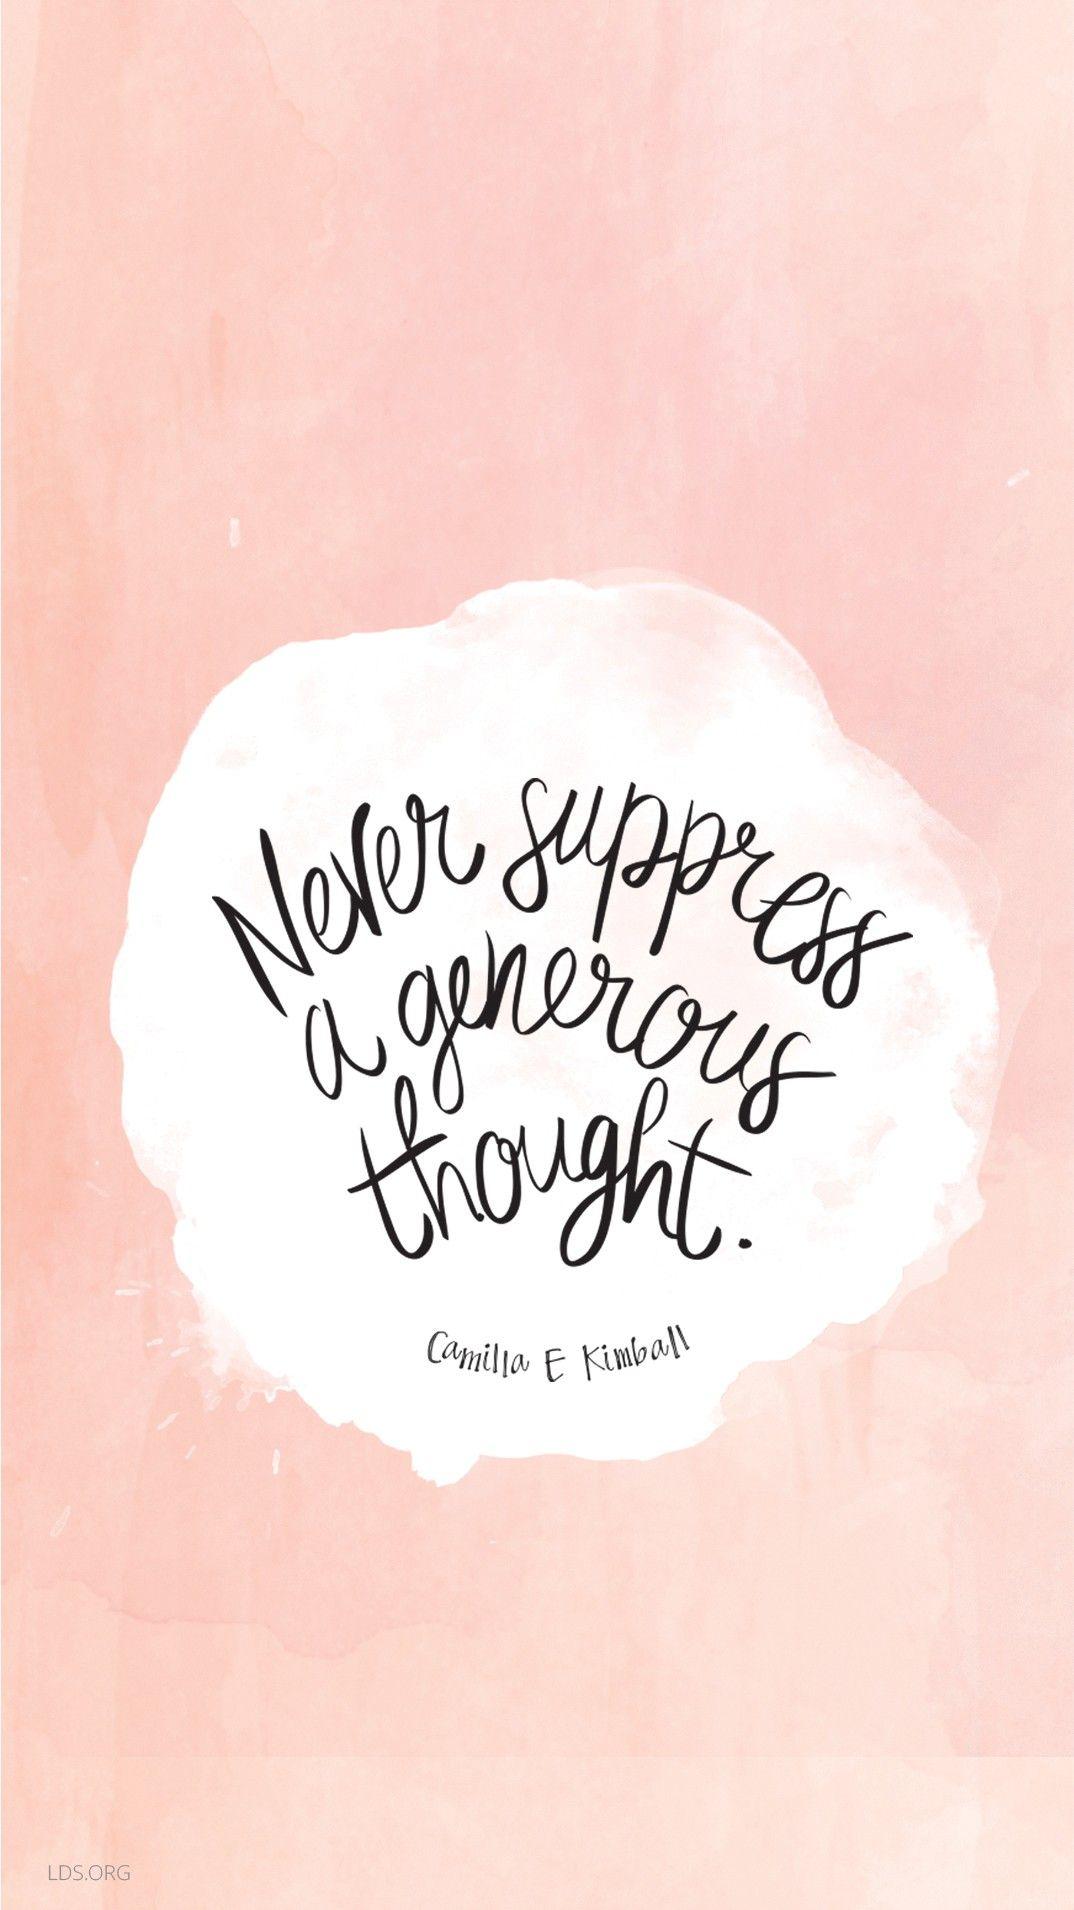 """Never suppress a generous thought."" —Camilla E. Kimball"